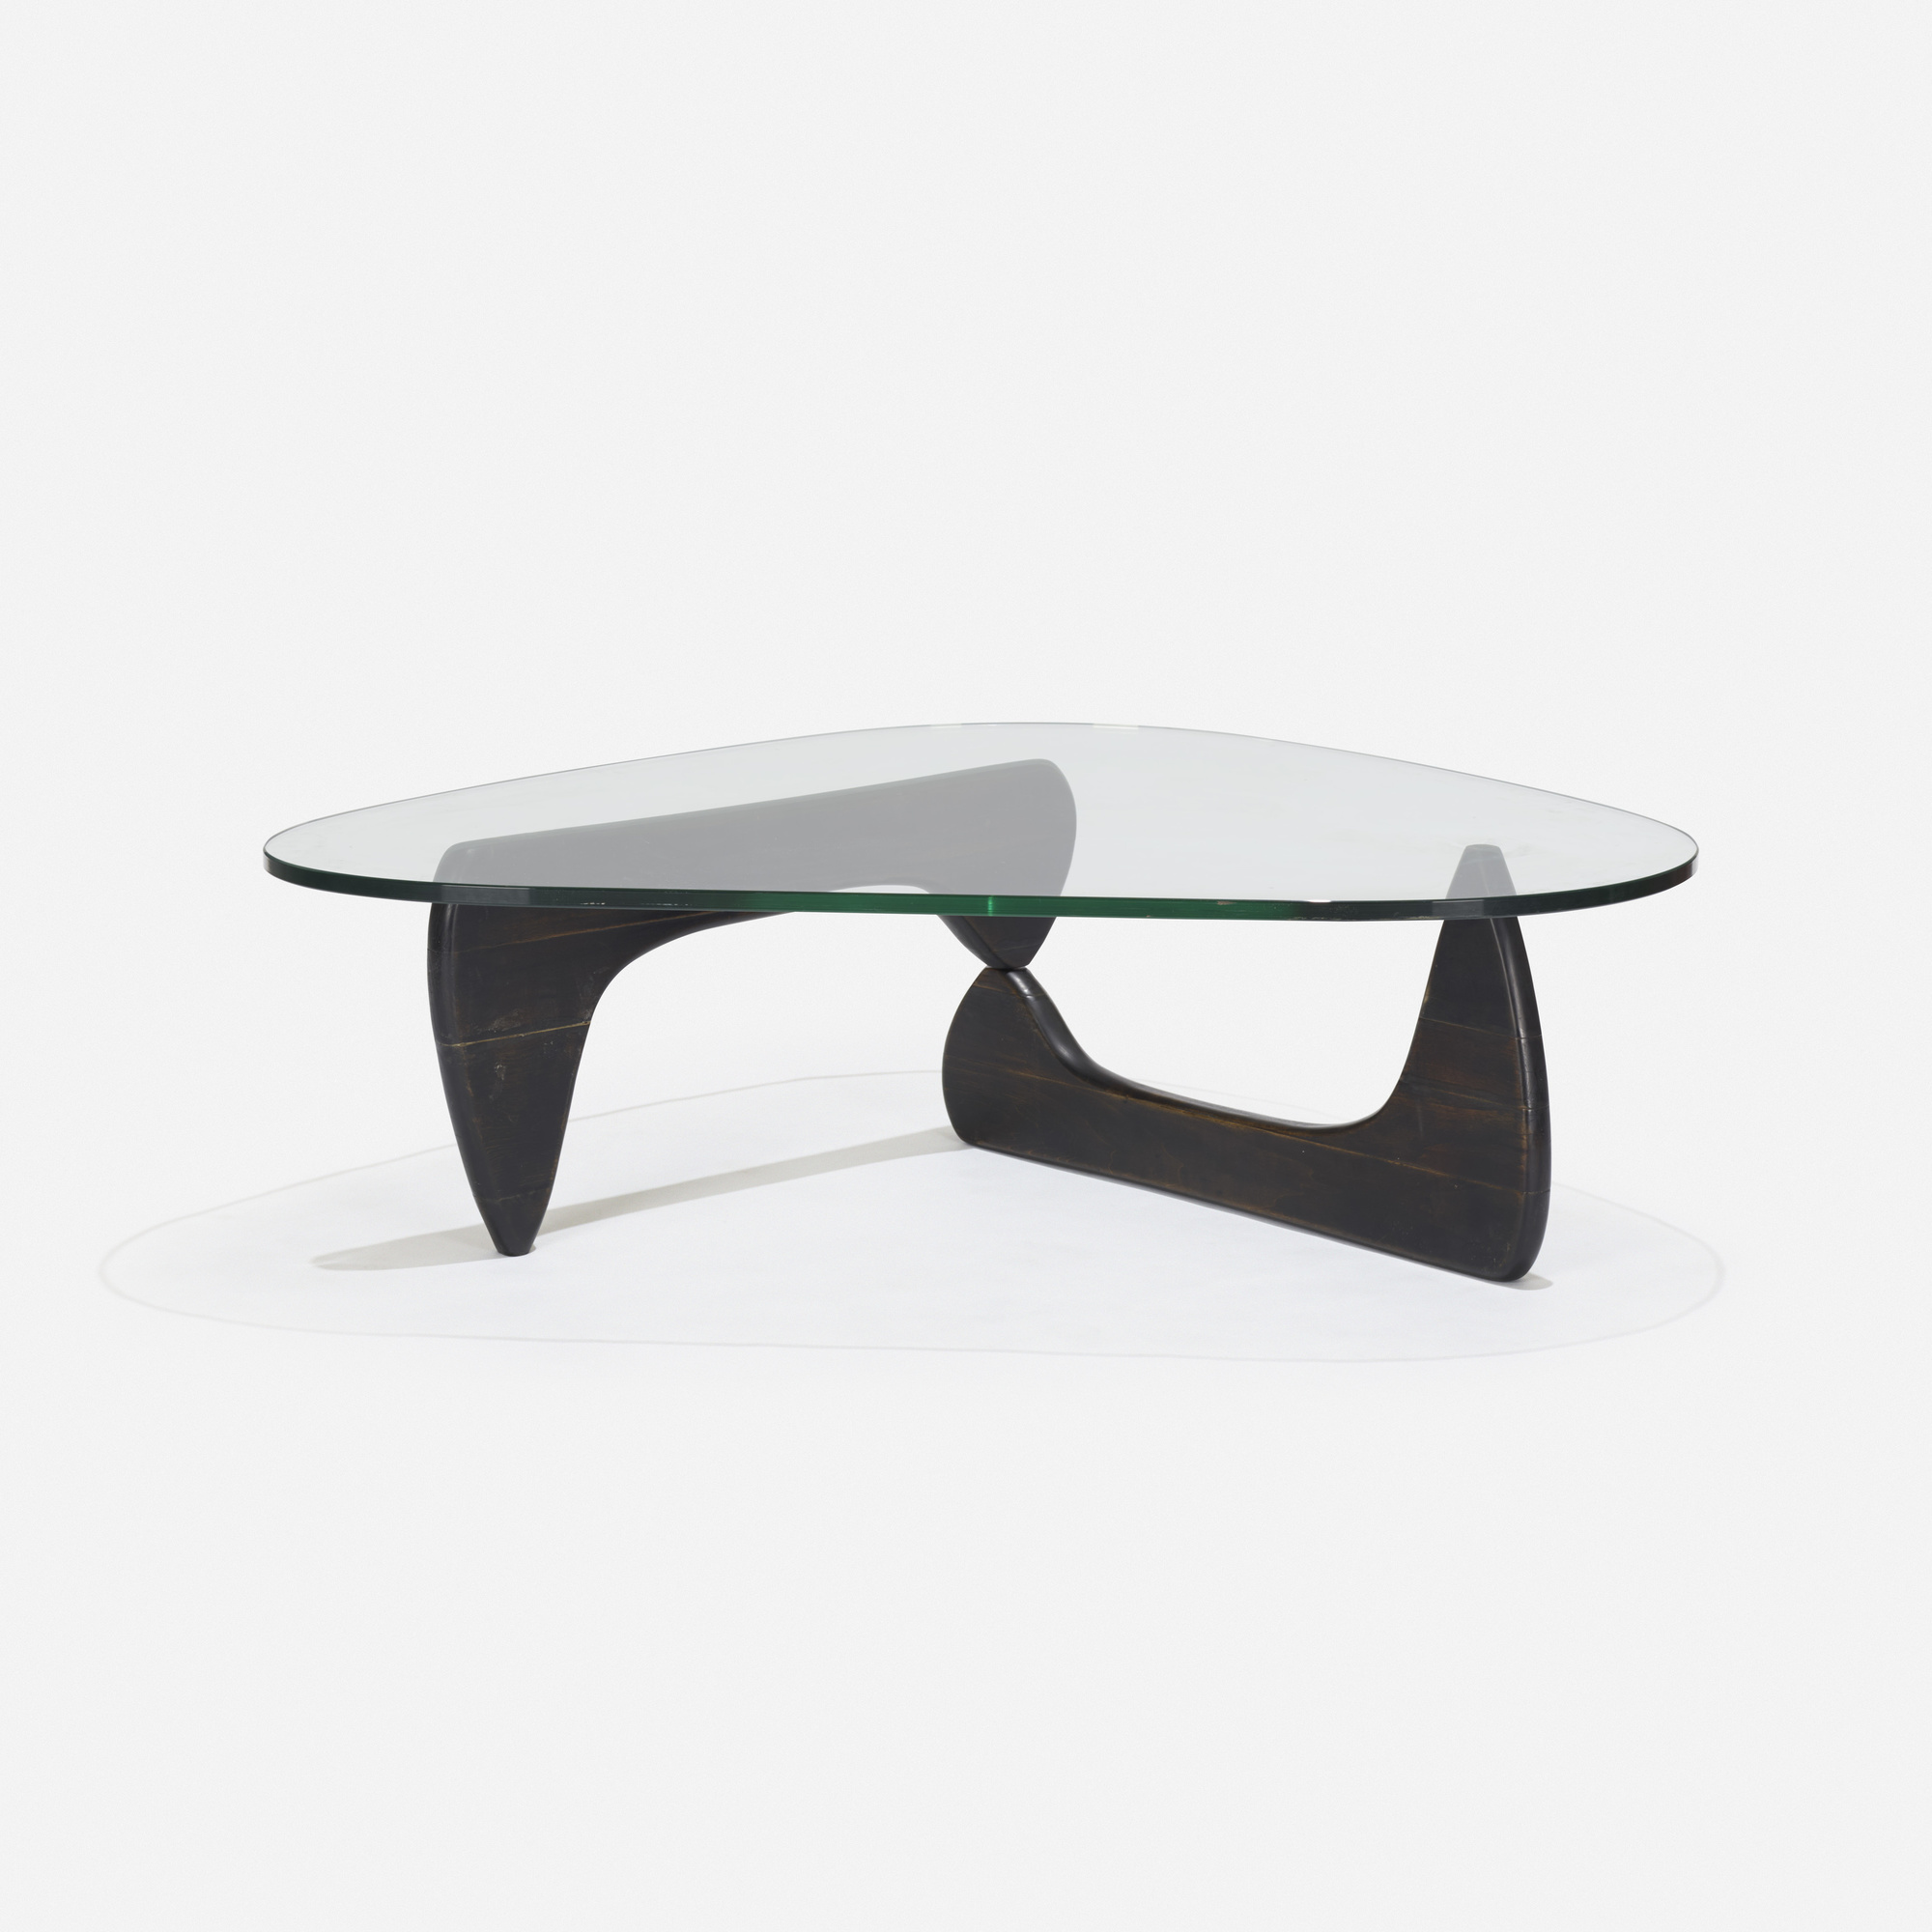 Genial 154: Isamu Noguchi / Coffee Table, Model IN 50 (1 Of 2